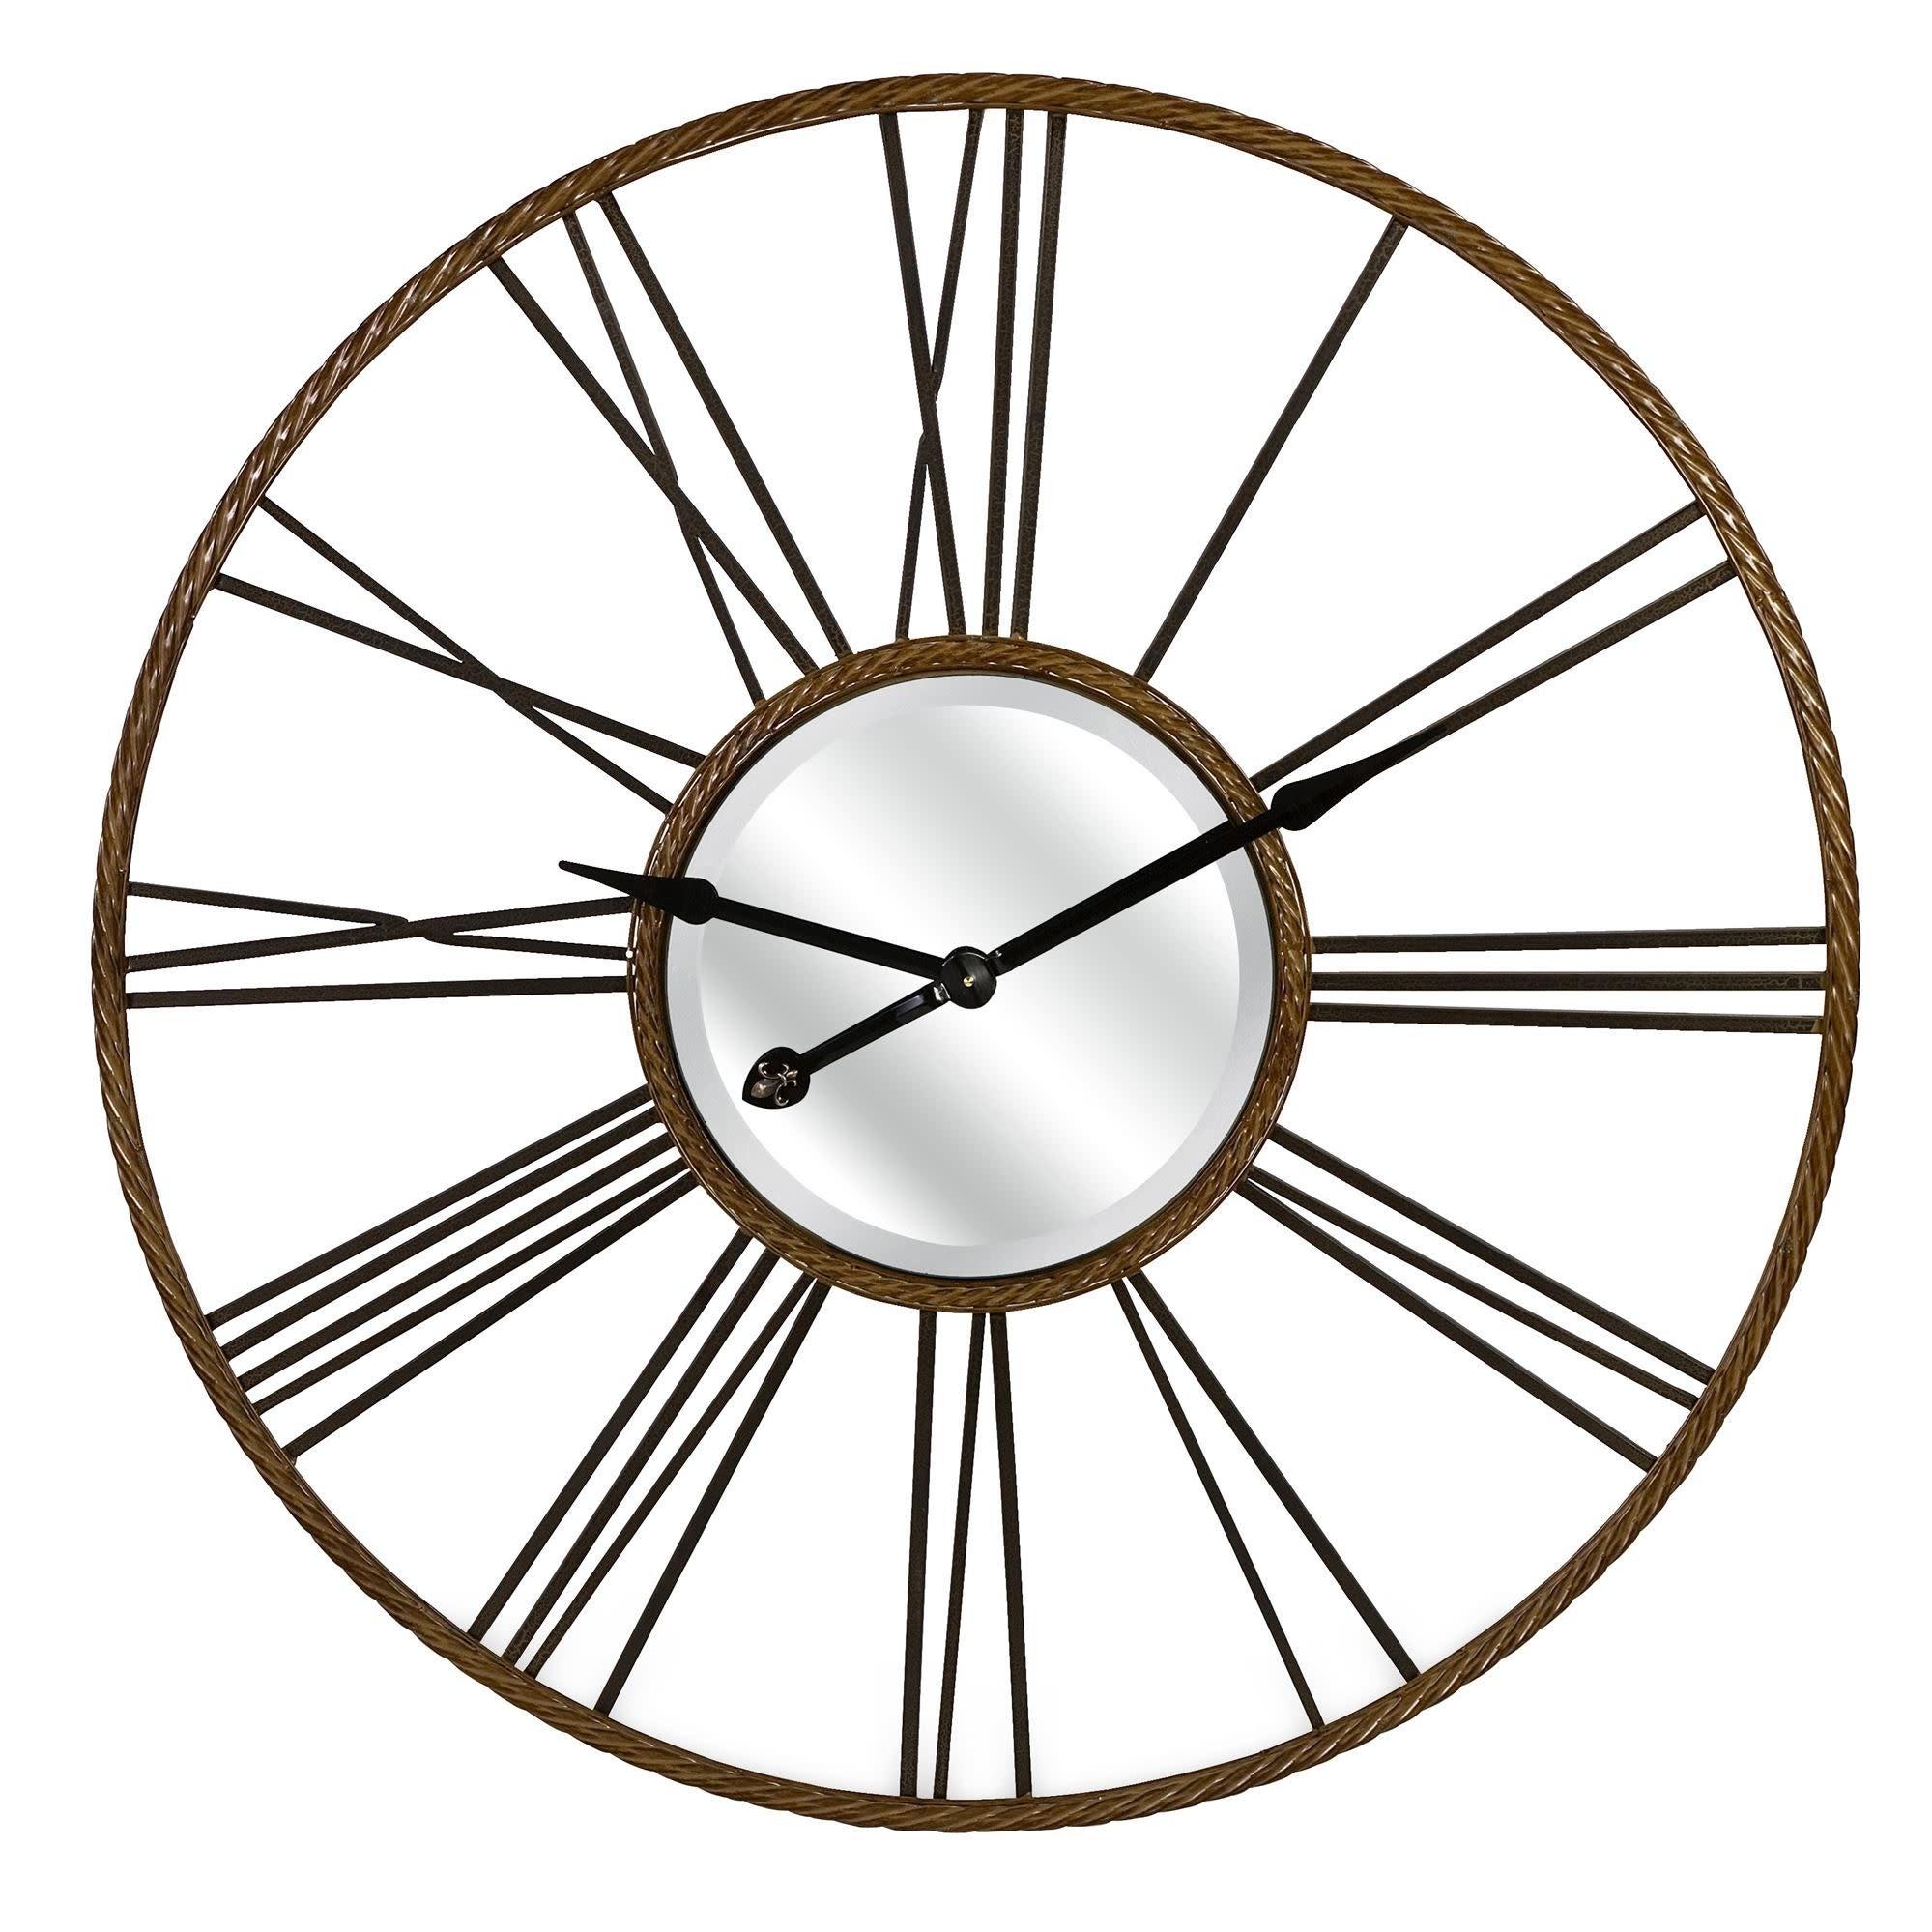 IMAX Home 27510  42 Diameter CKI Rocca Analog Wall Clock - Gray